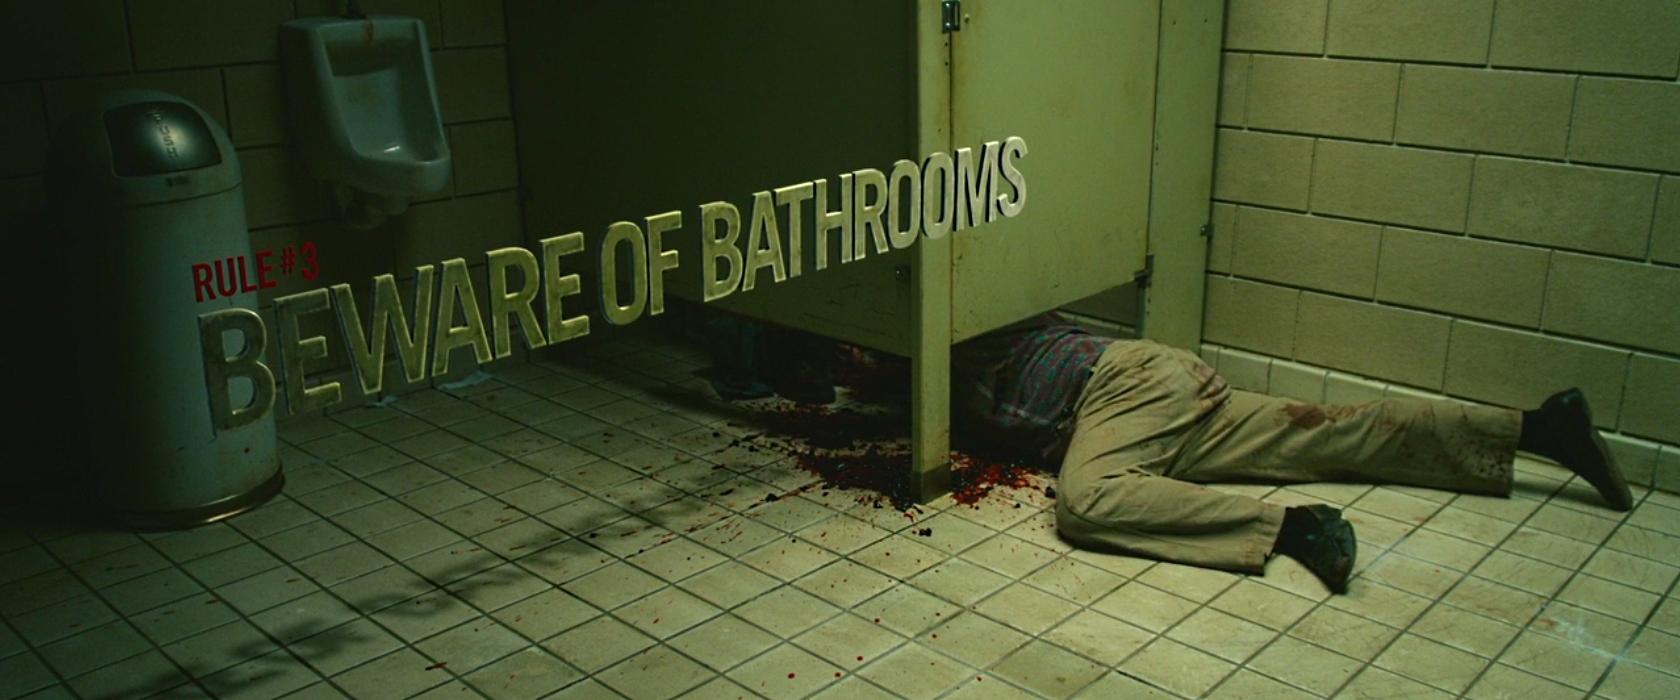 Rule 3 Beware Of Bathrooms By Bubimandril On Deviantart